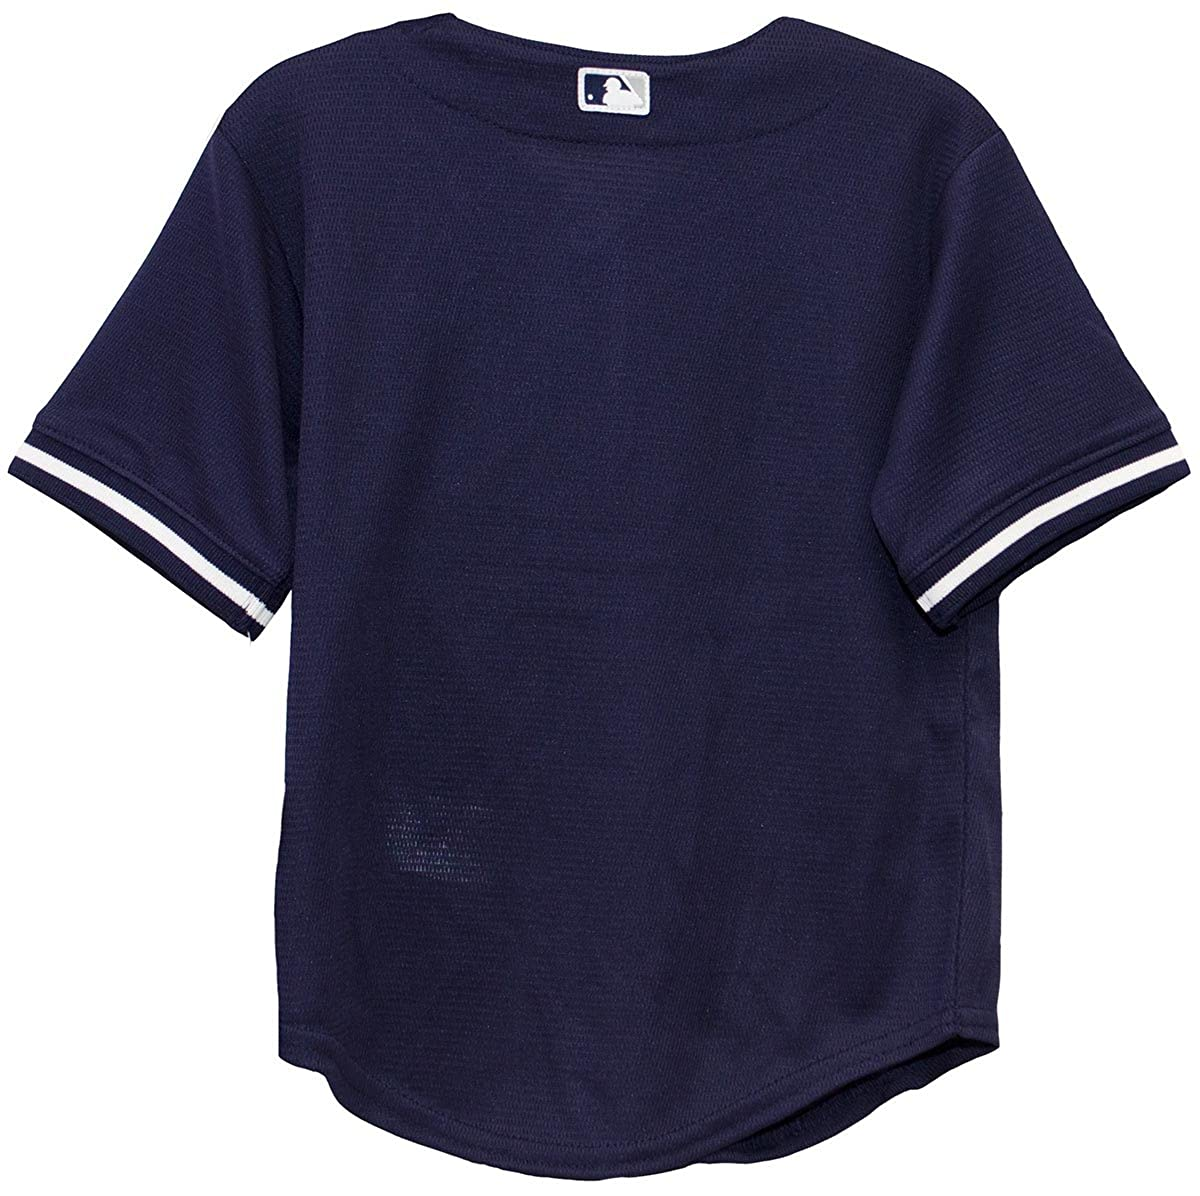 2571442deb5 Amazon.com   Majestic New York Yankees MLB Toddler Navy Blue White Baseball  Jersey (Toddler 2T)   Sports   Outdoors